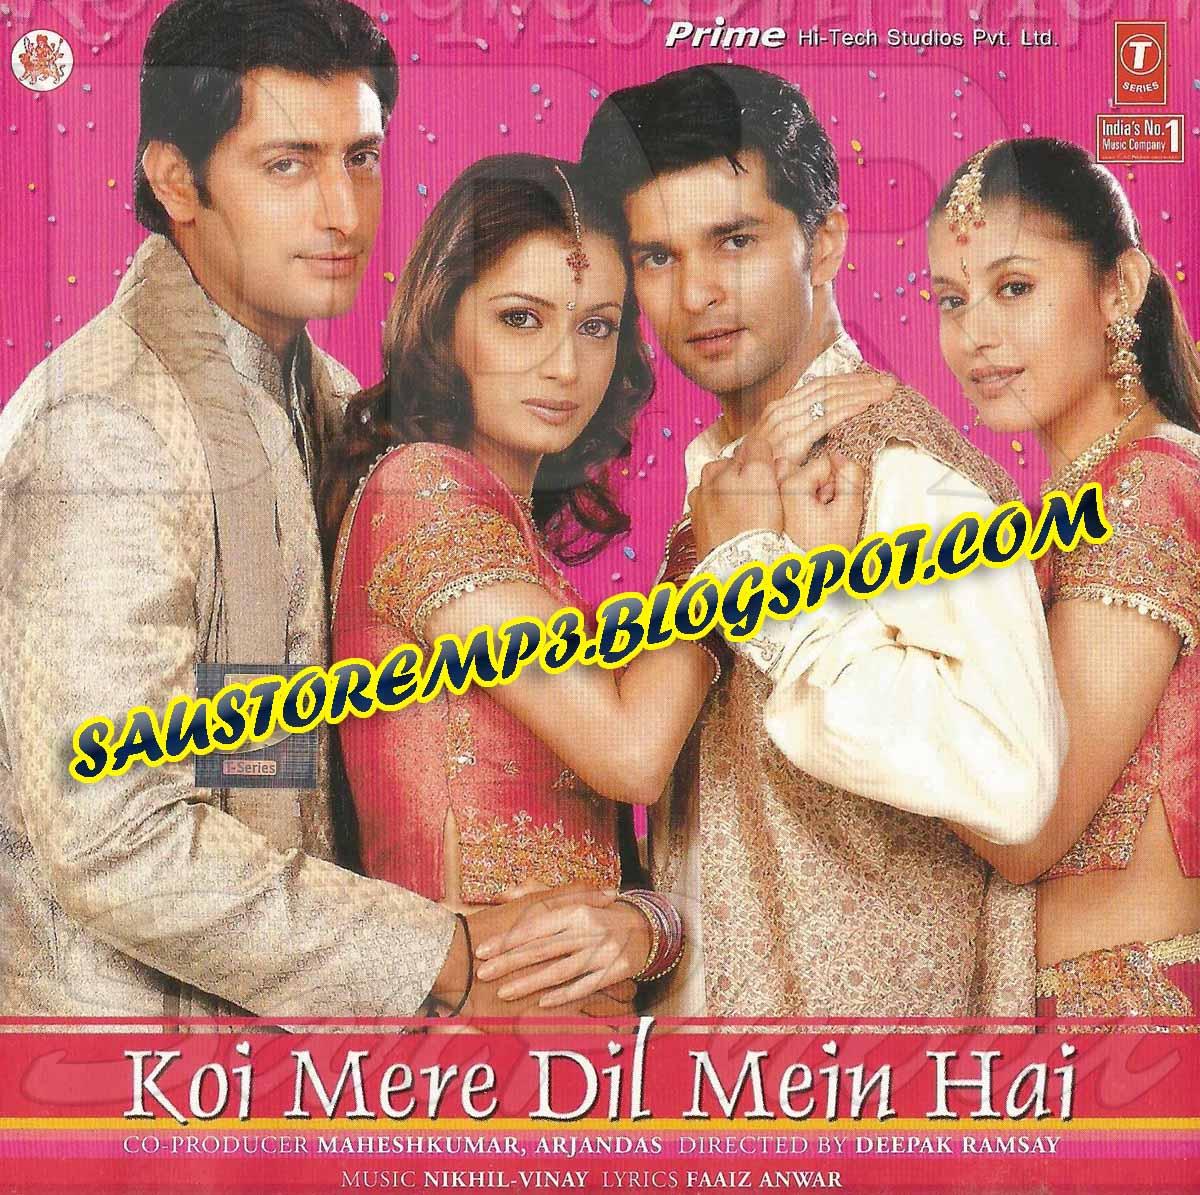 Mp3 Song Download Koi Puche Mere Dil Se: Www.saustoremp3.blogspot.com: Anuradha Paudwal